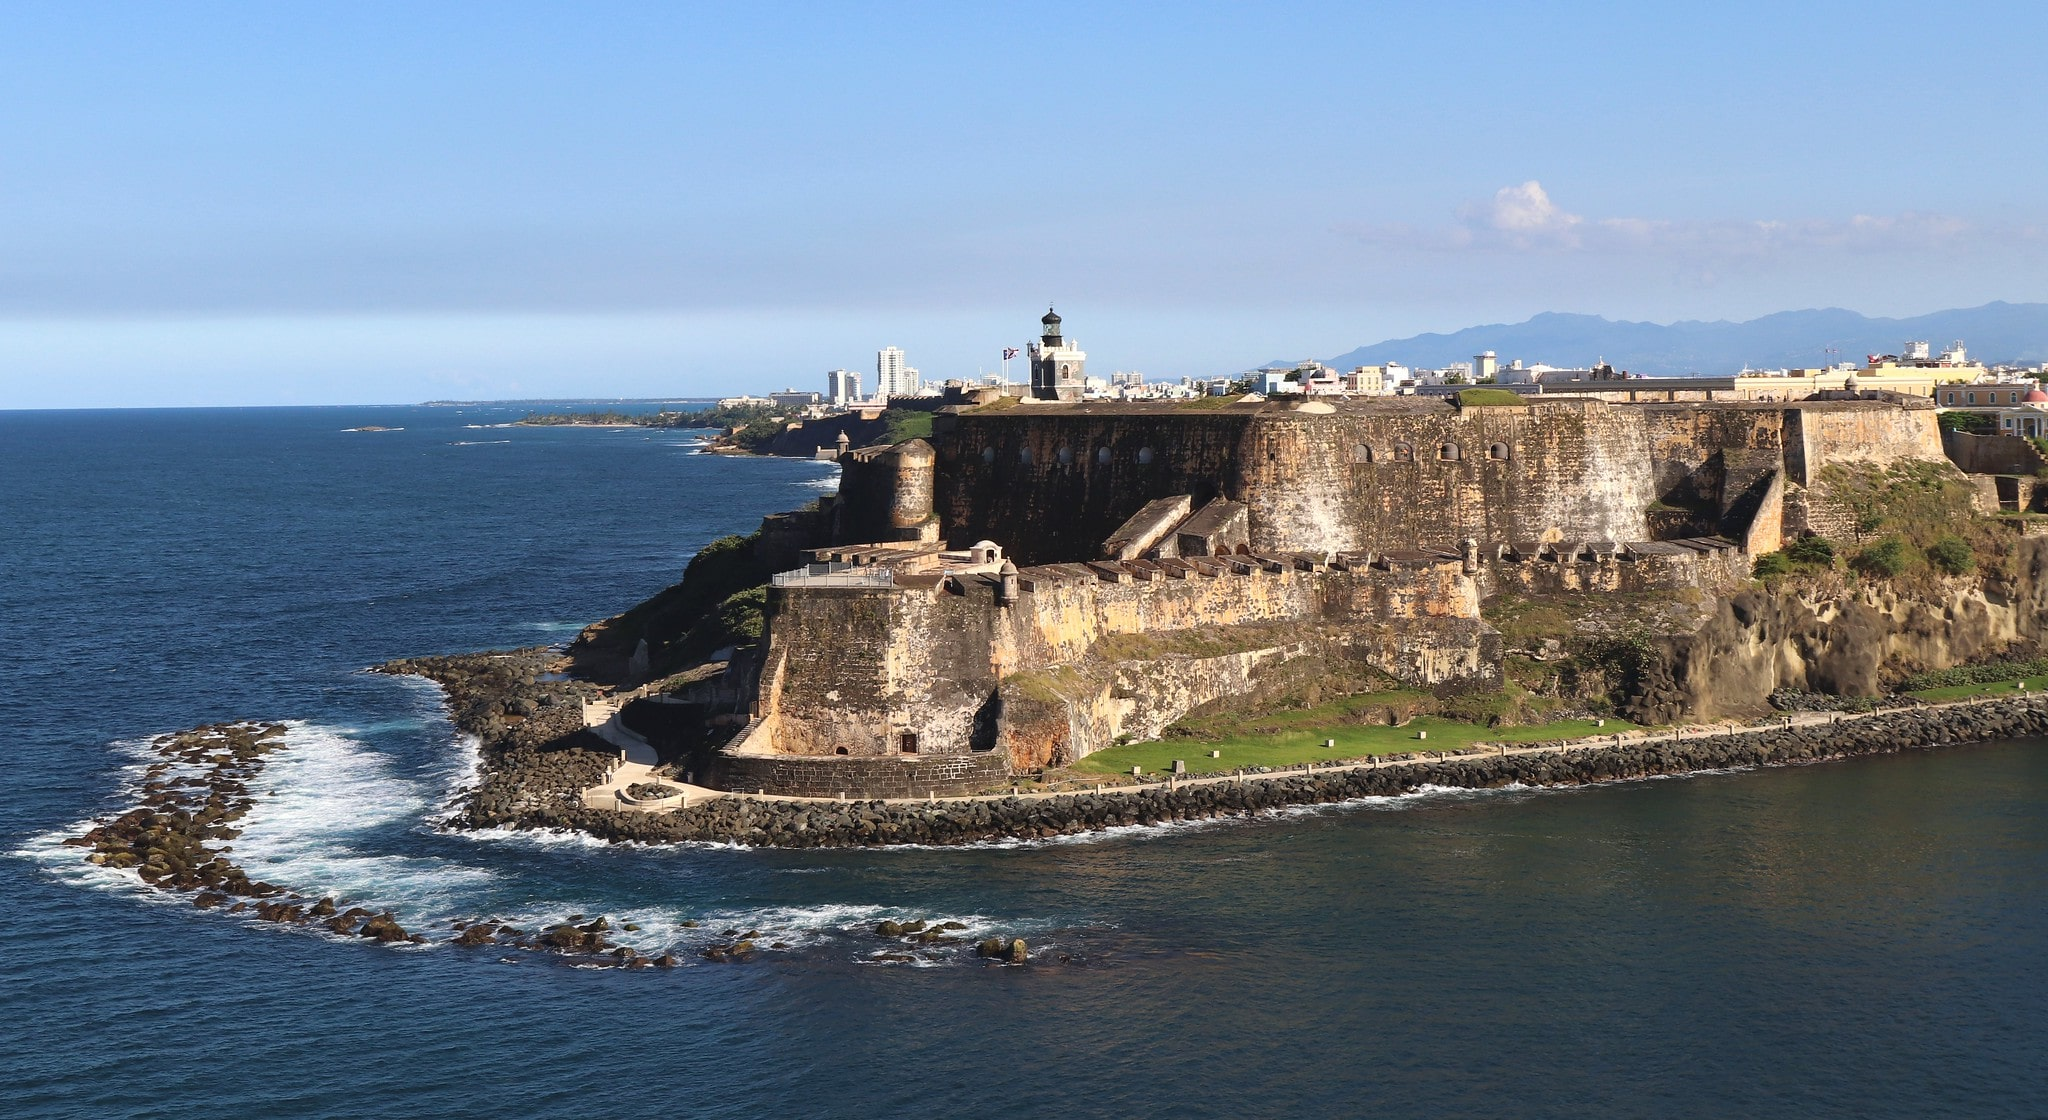 Castillo San Felipe del Morro is one of the top landmarks in Puerto Rico